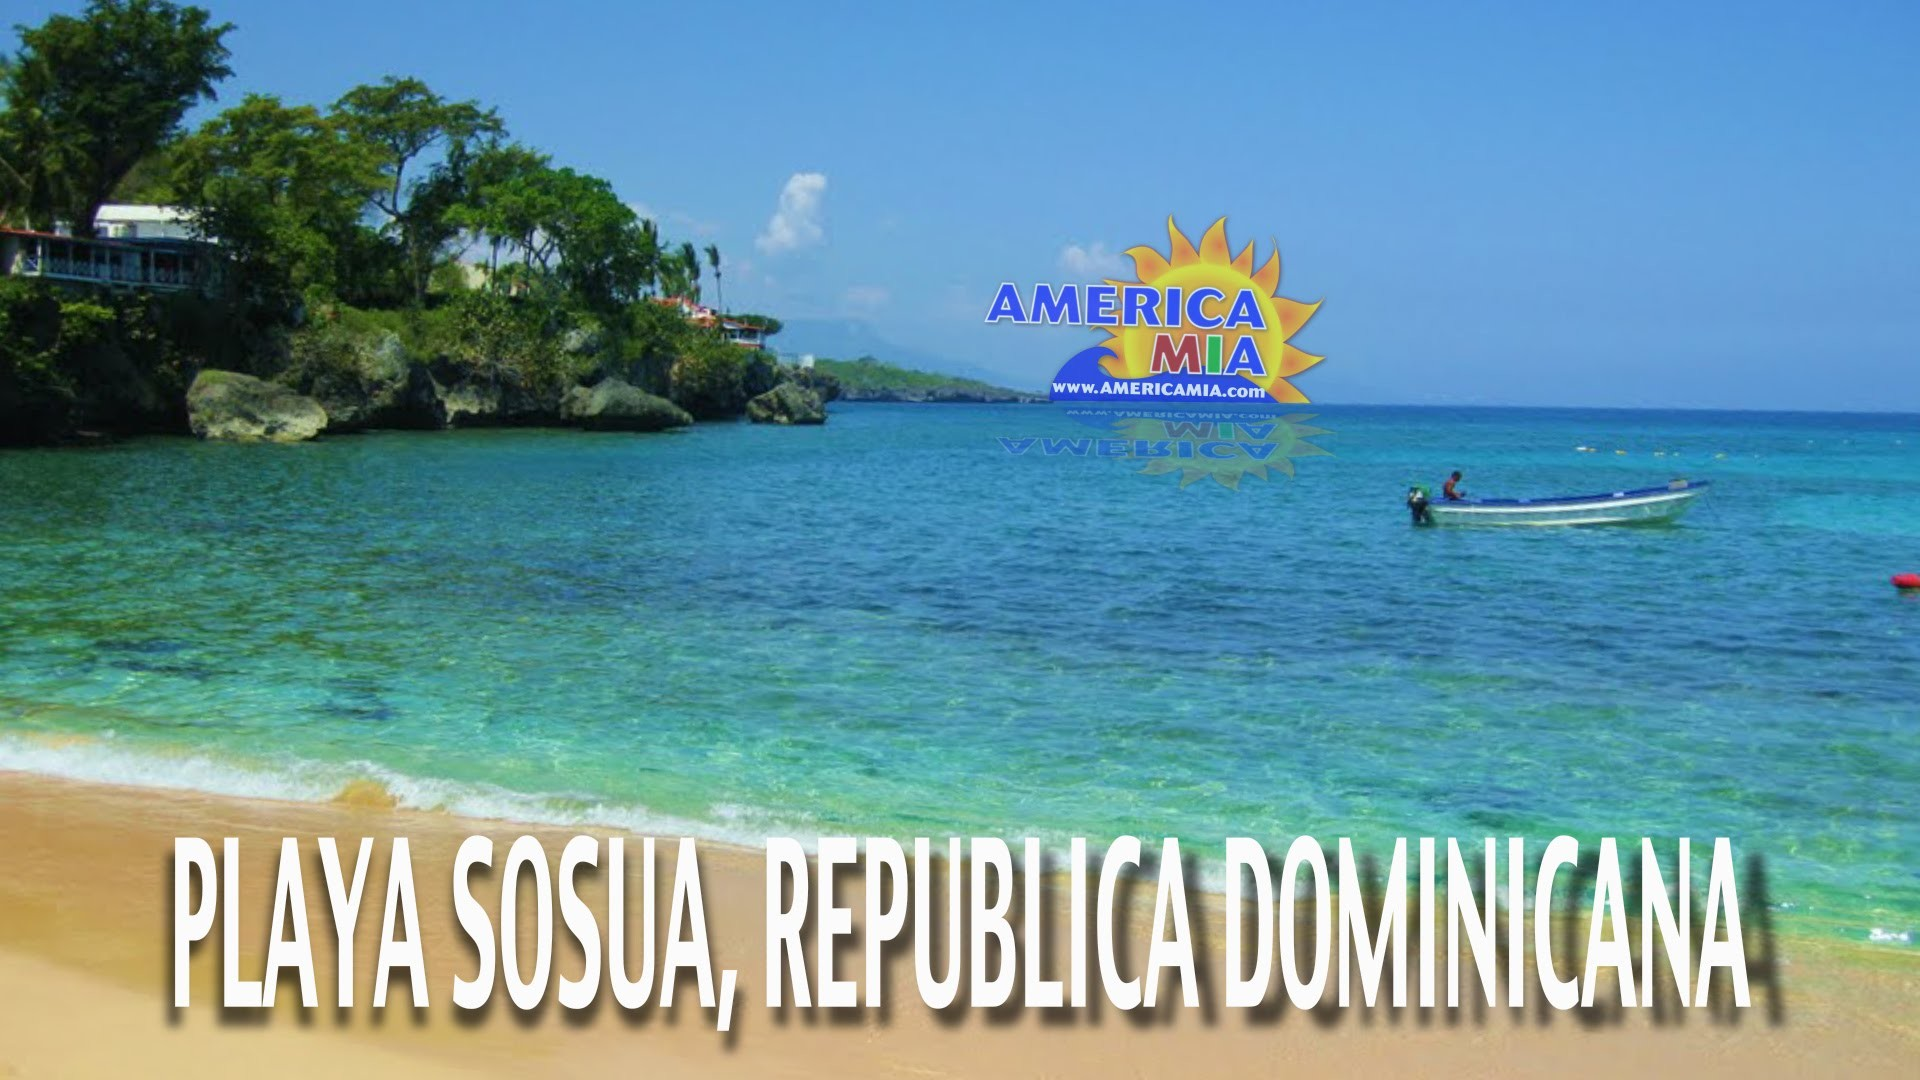 PLAYA SOSUA, REPUBLICA DOMINICANA (SOSUA BEACH, DOMINICAN REPUBLIC) –  YouTube